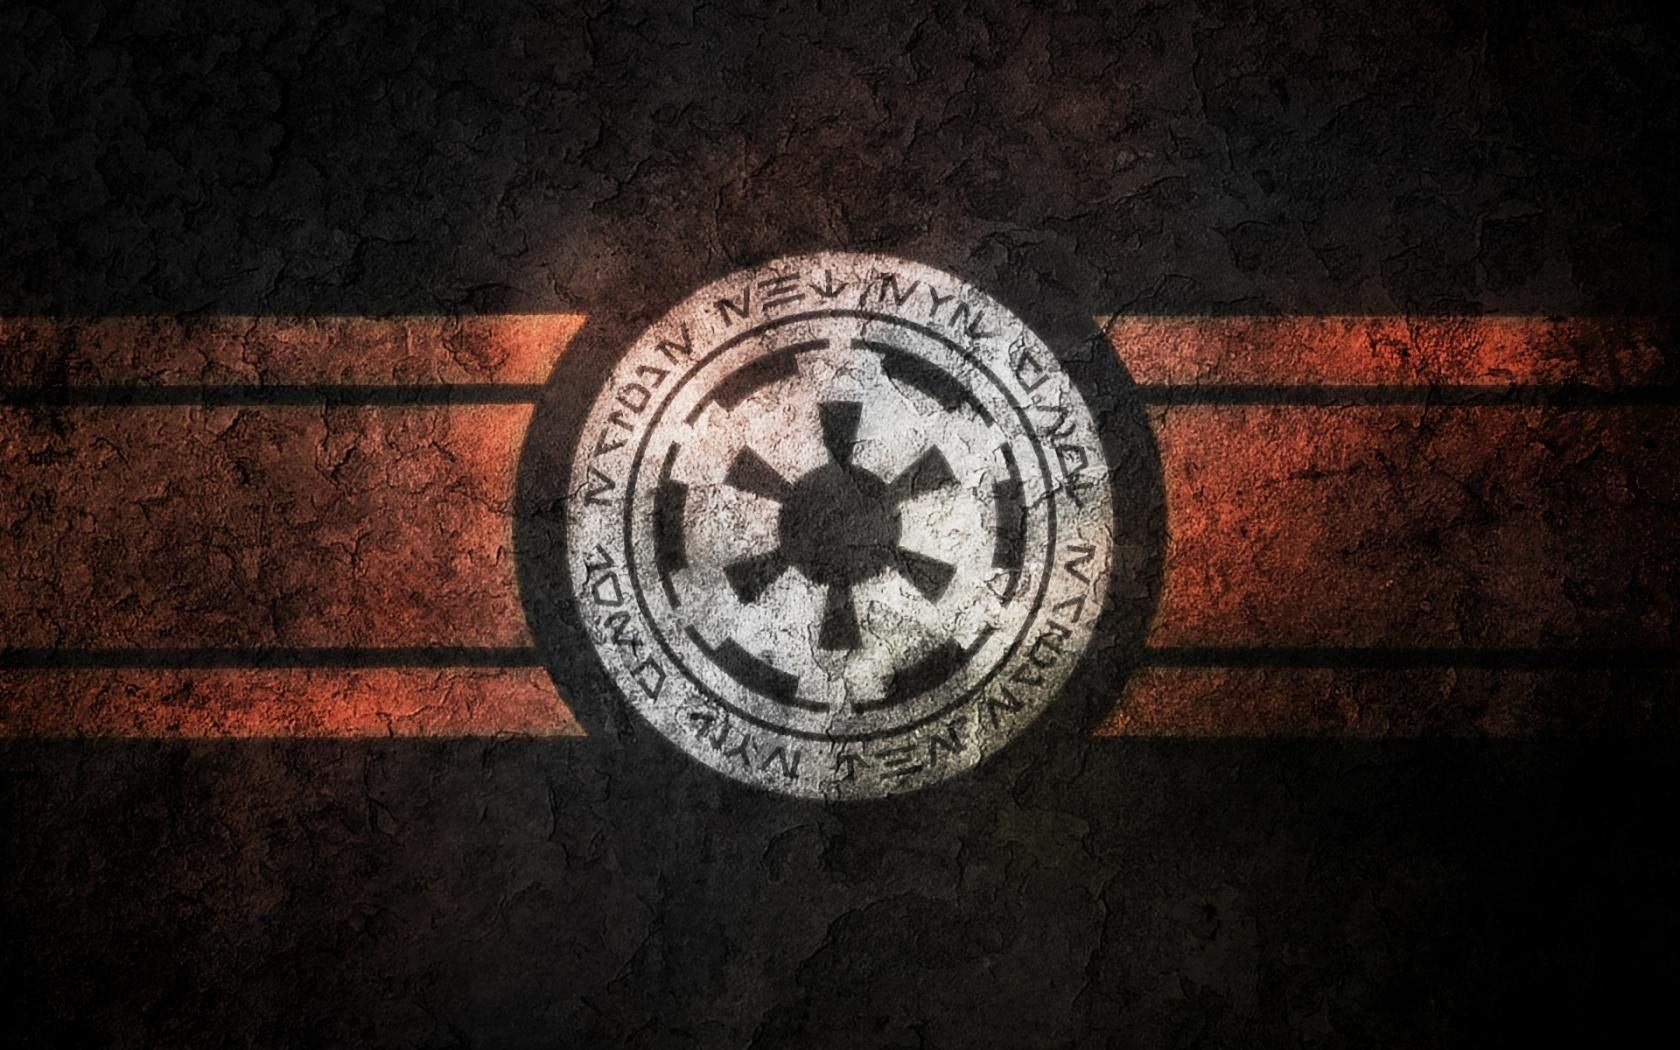 Star Wars Empire Wallpapers 1080p For Desktop Wallpaper 1680 X 1050 Px 530 05 Kb Symbol Code Knight Star Wars Wallpaper Star Wars Empire Logo Star Wars Poster